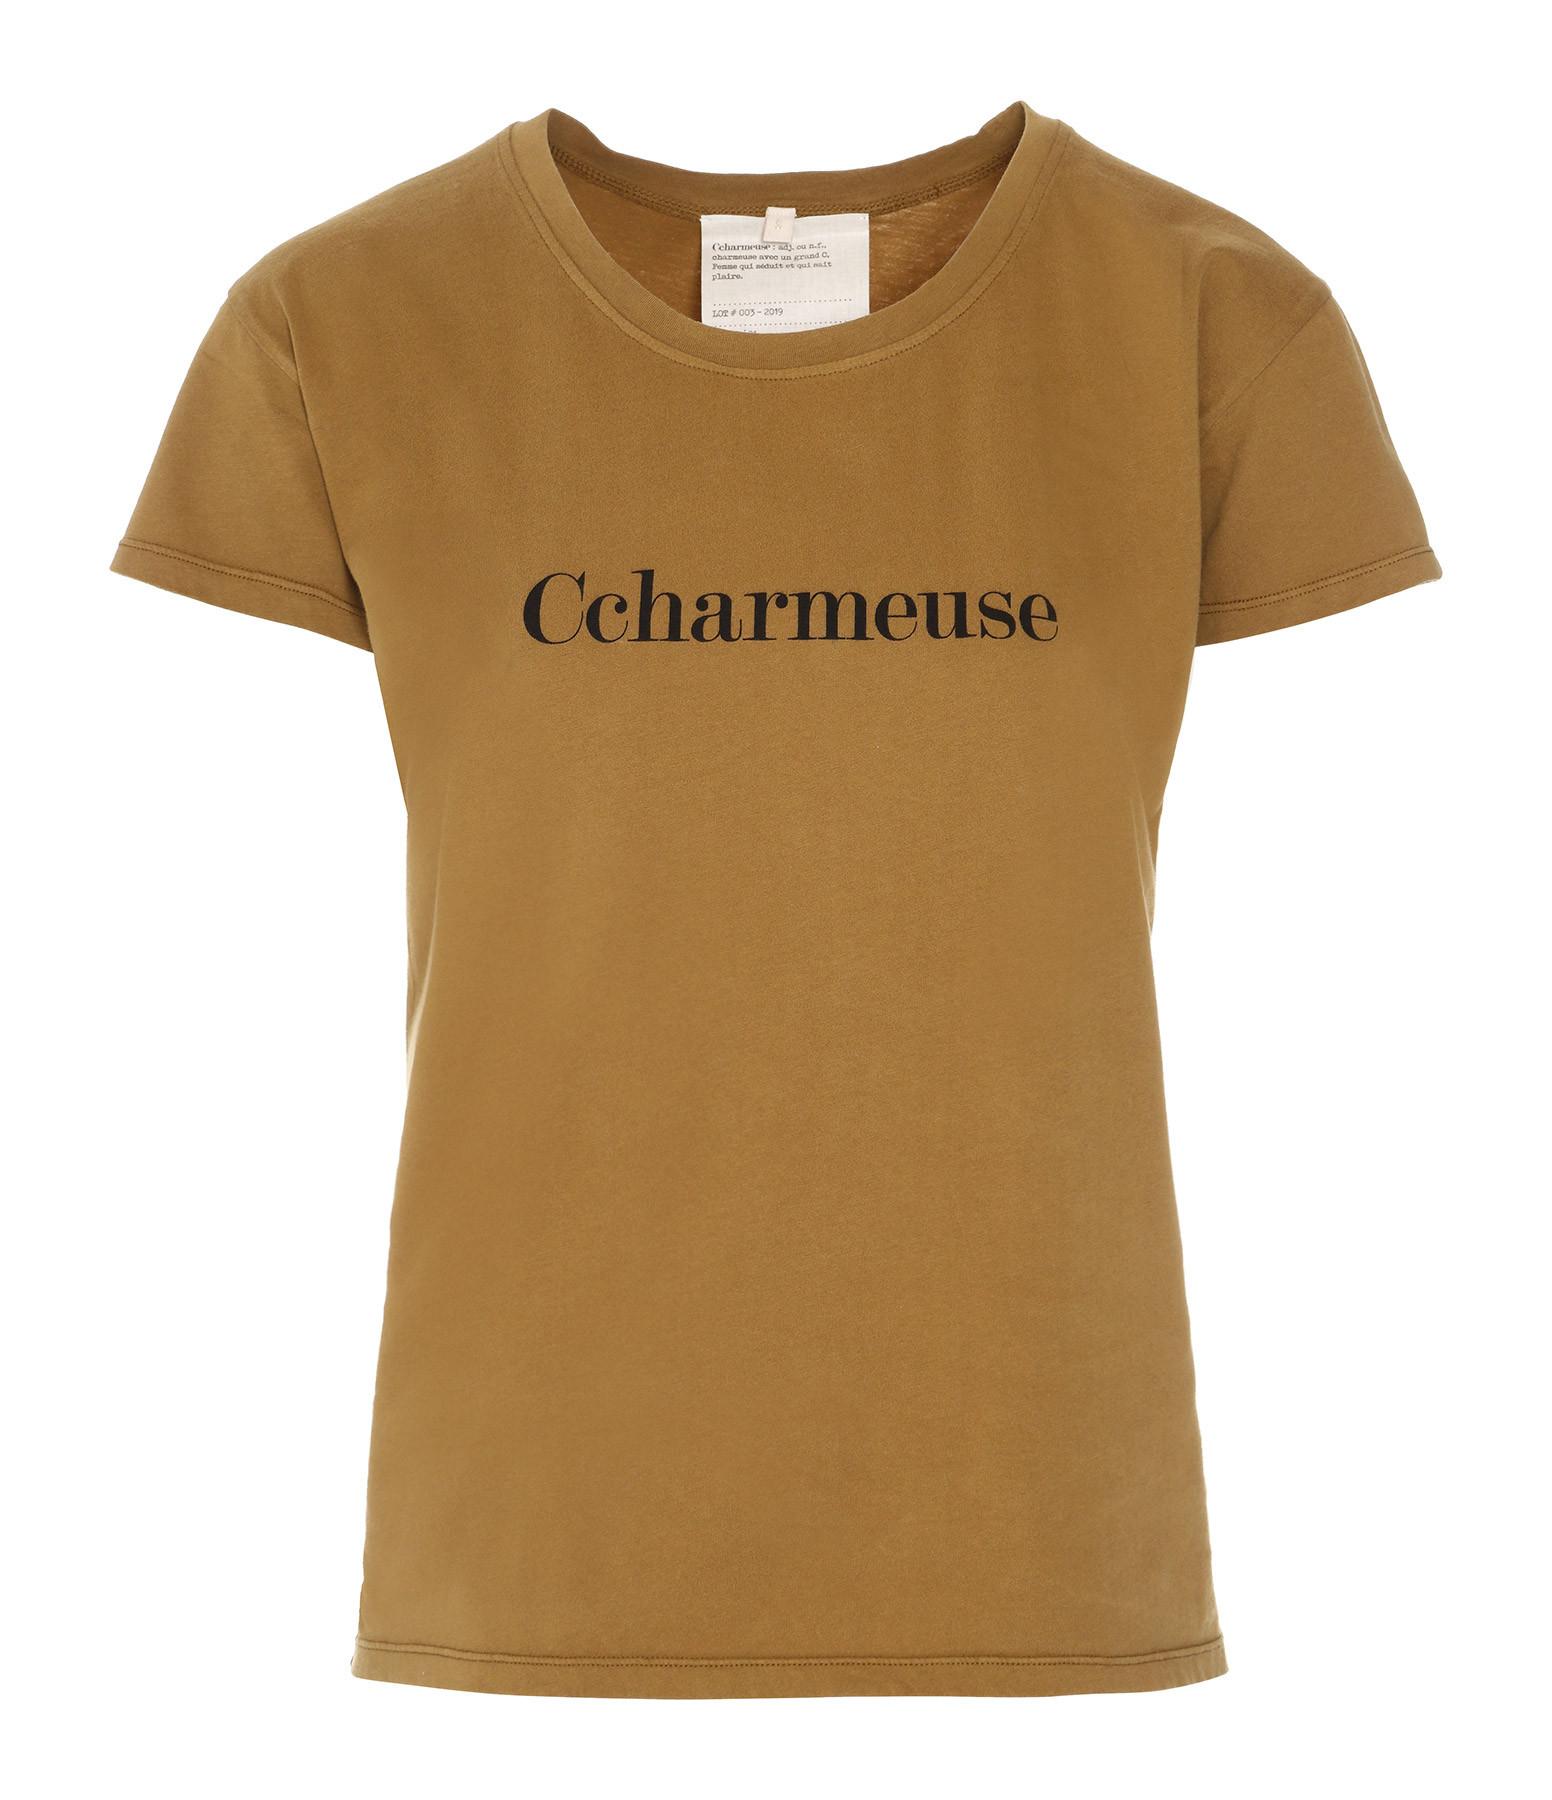 VANESSA BRUNO - Tee-shirt Ccharmeuse Coton Kaki